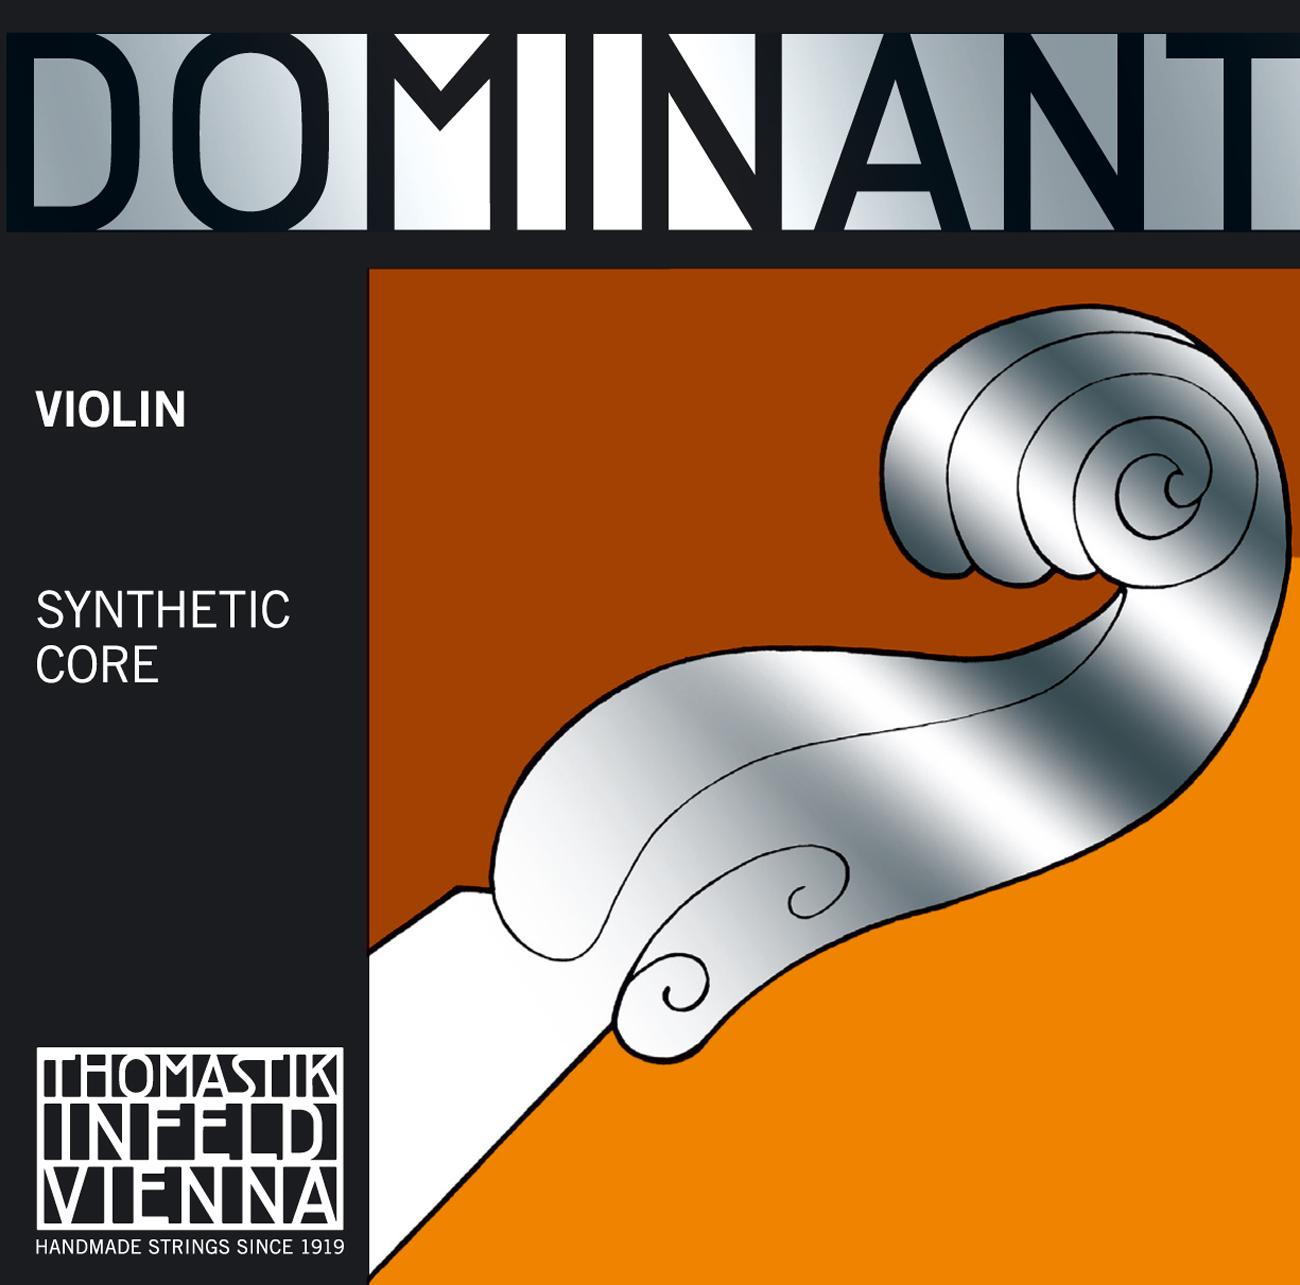 Dominant Violin E Aluminium ball 4/4